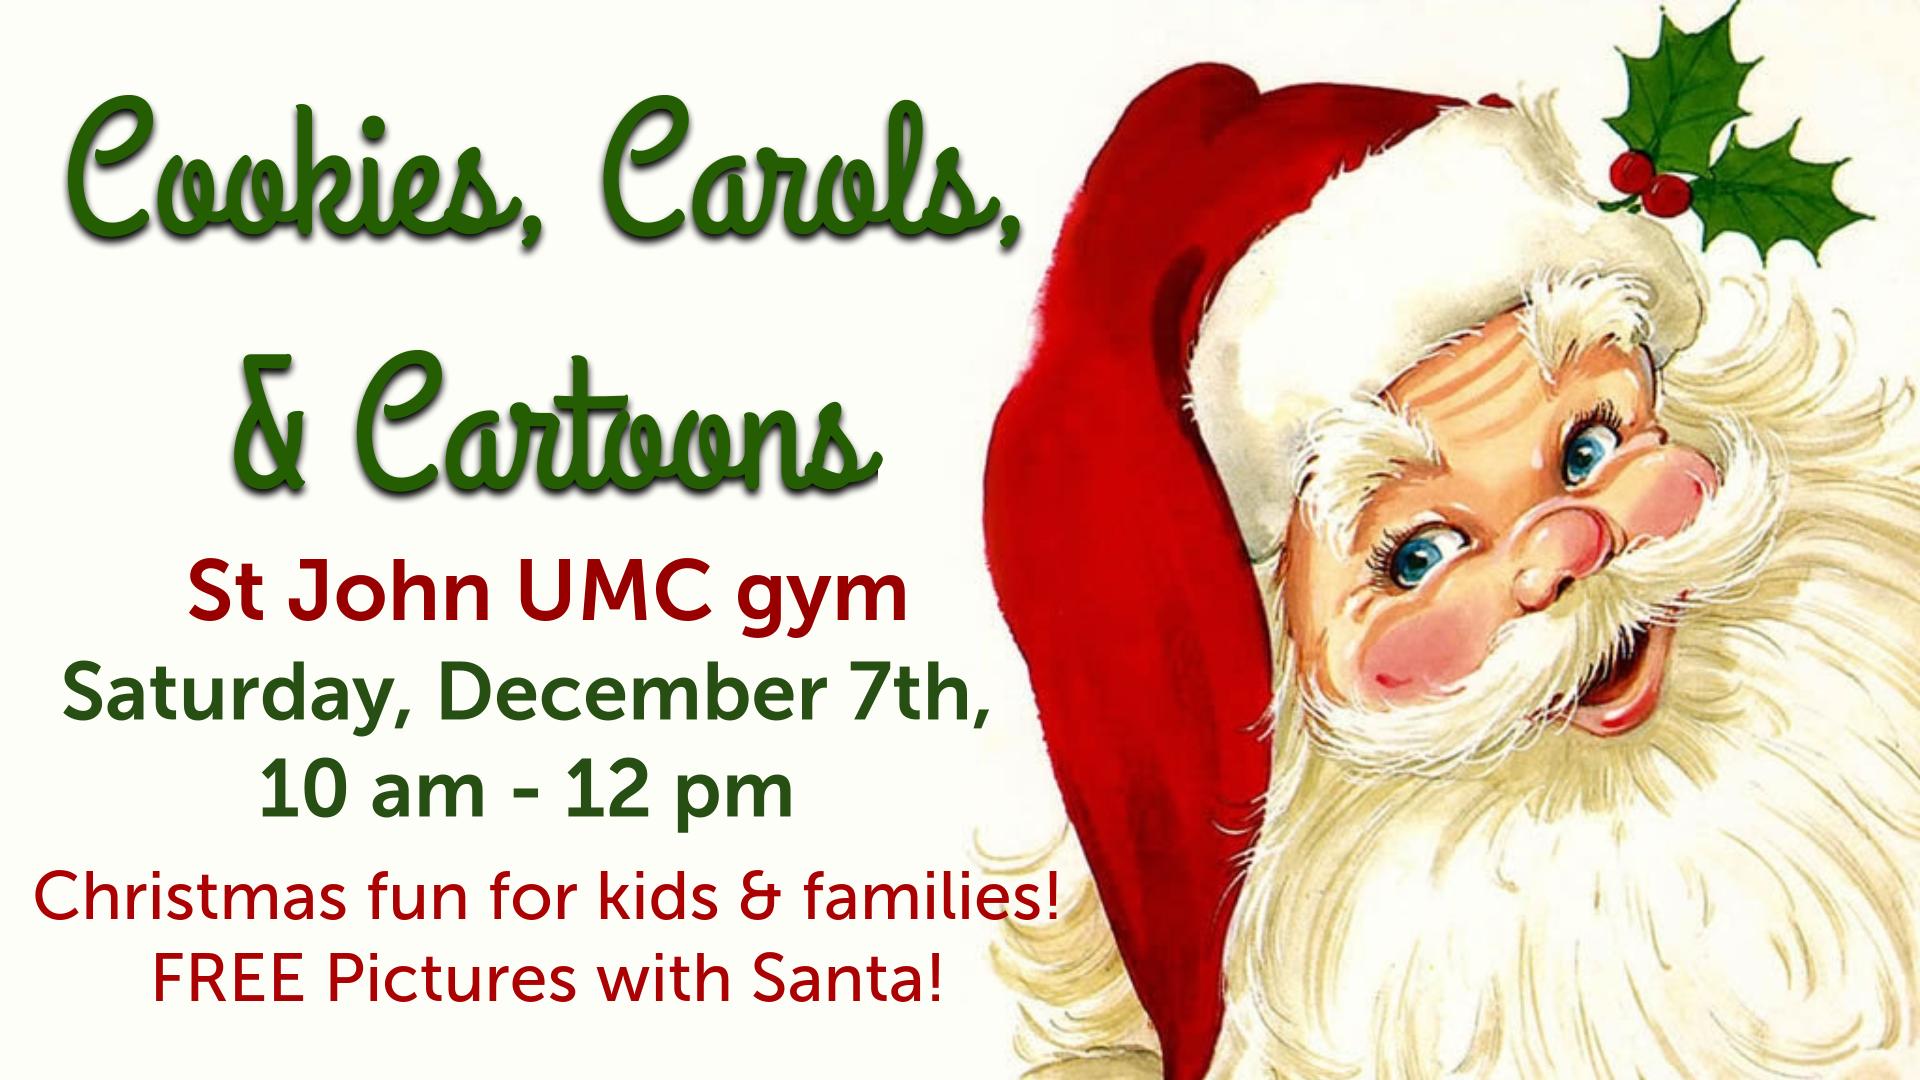 Cookies, Carols, & Cartoons